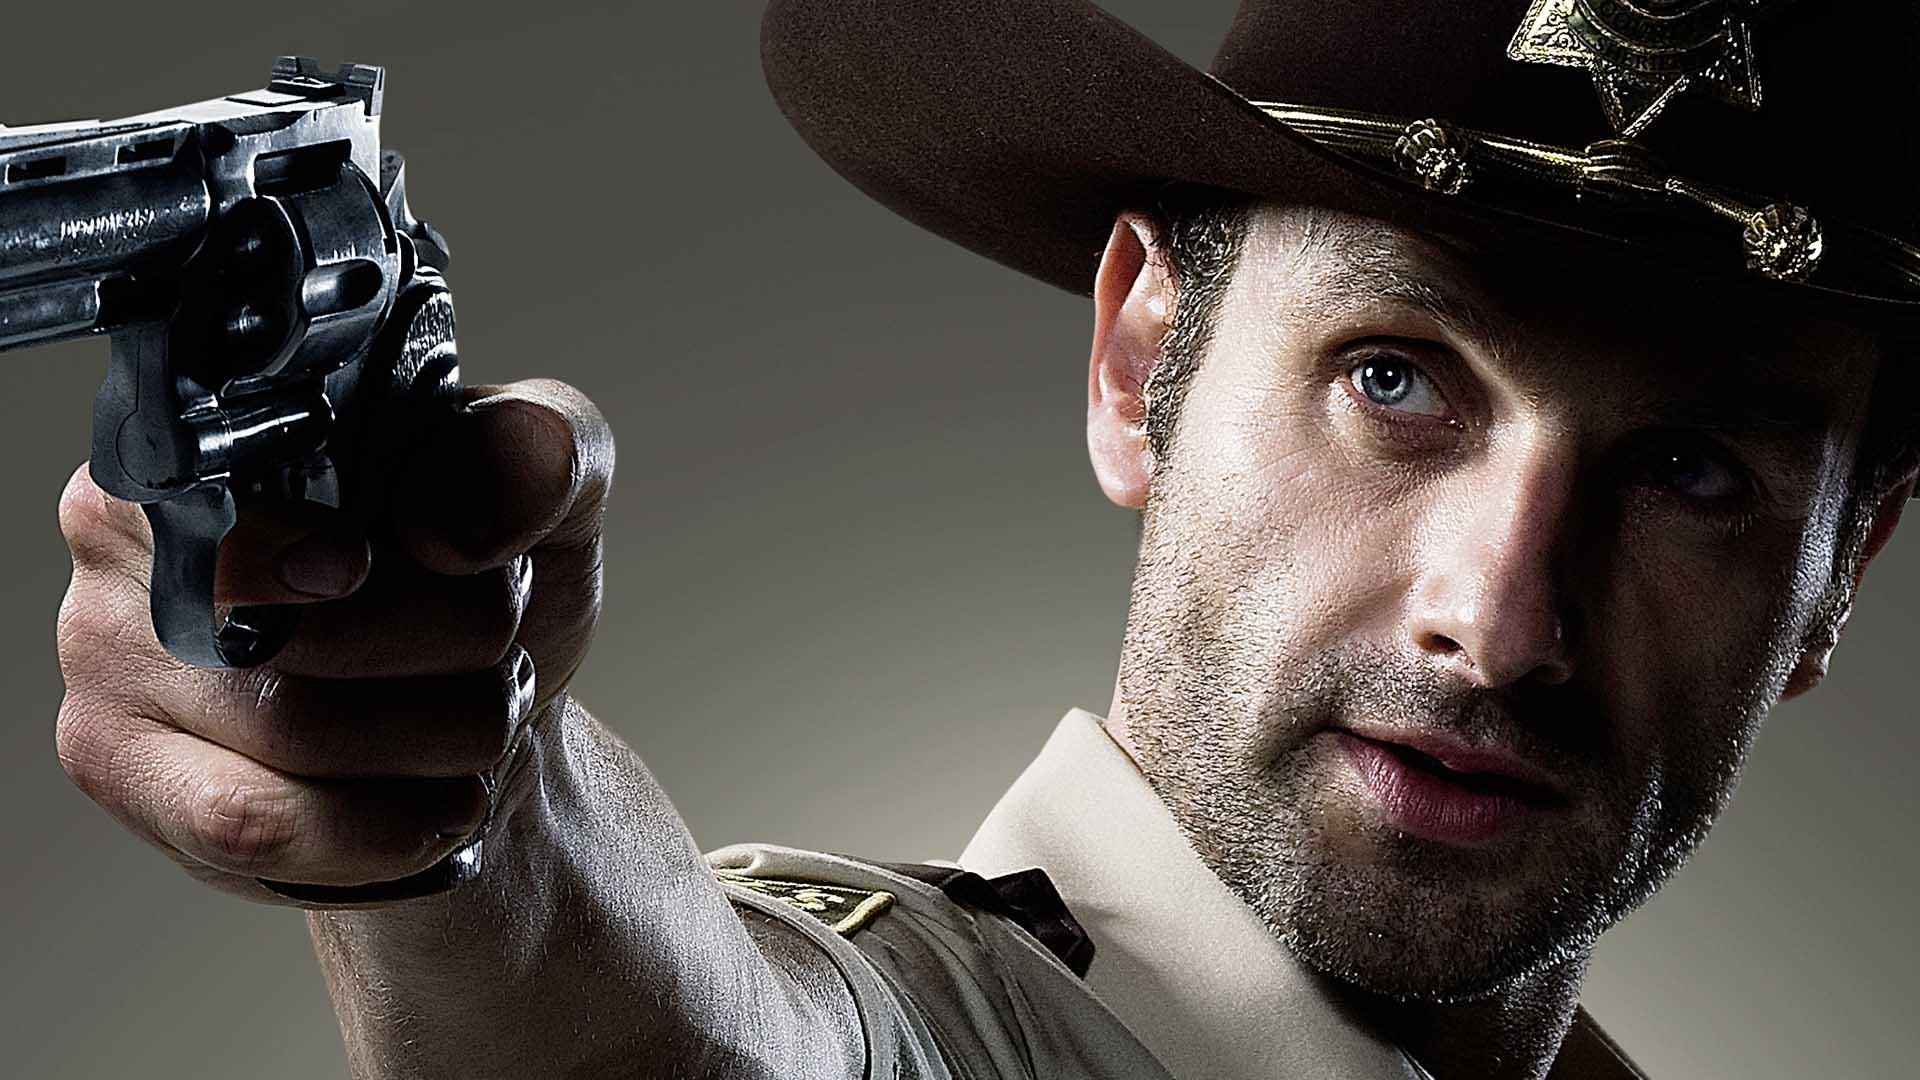 Girl Gun Desktop Wallpaper Video Extra The Walking Dead Who Is Rick Grimes The